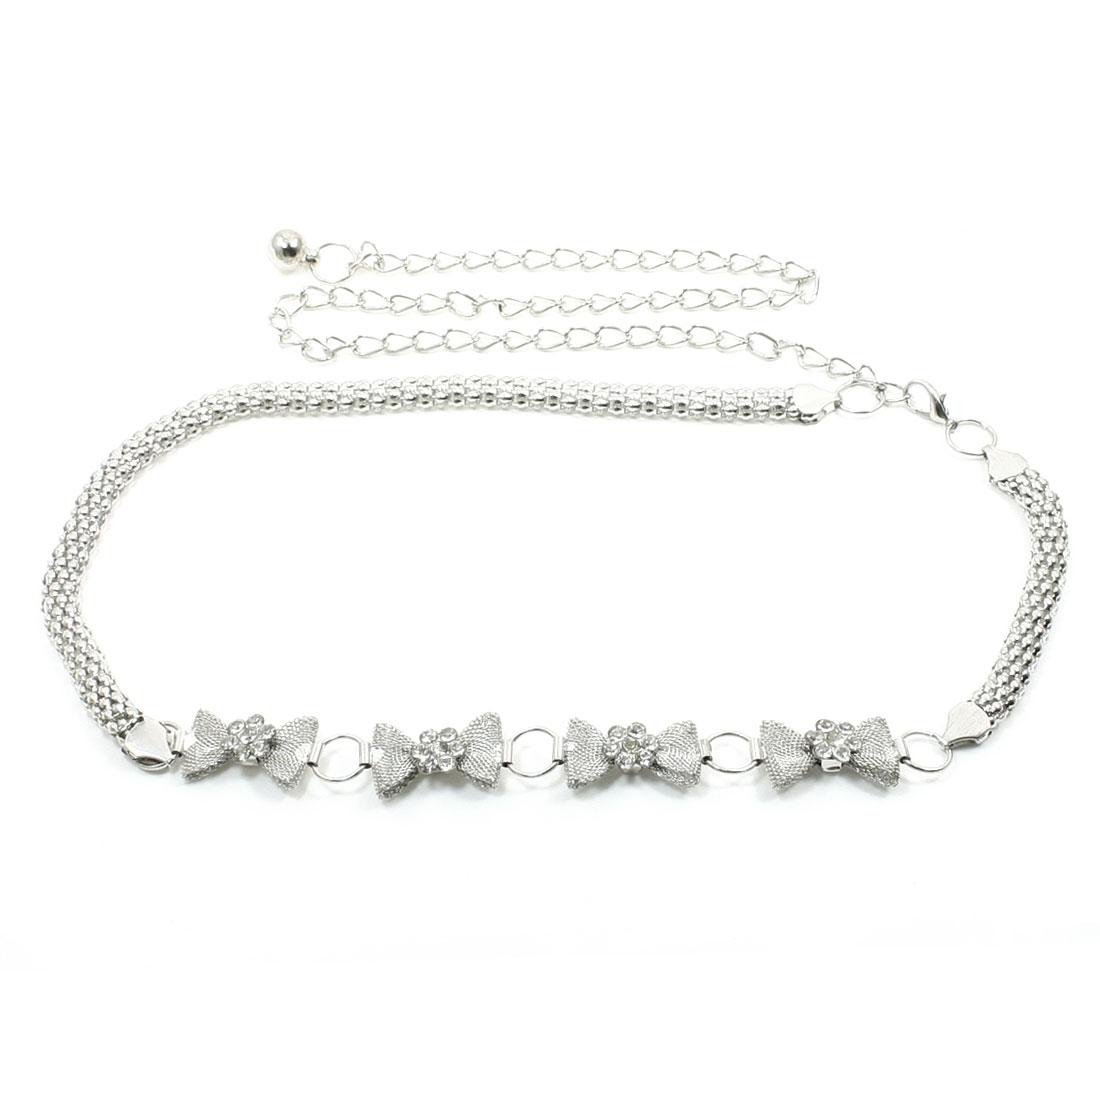 Woman Glitter Faux Crystals Silver Gray Adjustable Waist Chain Belt